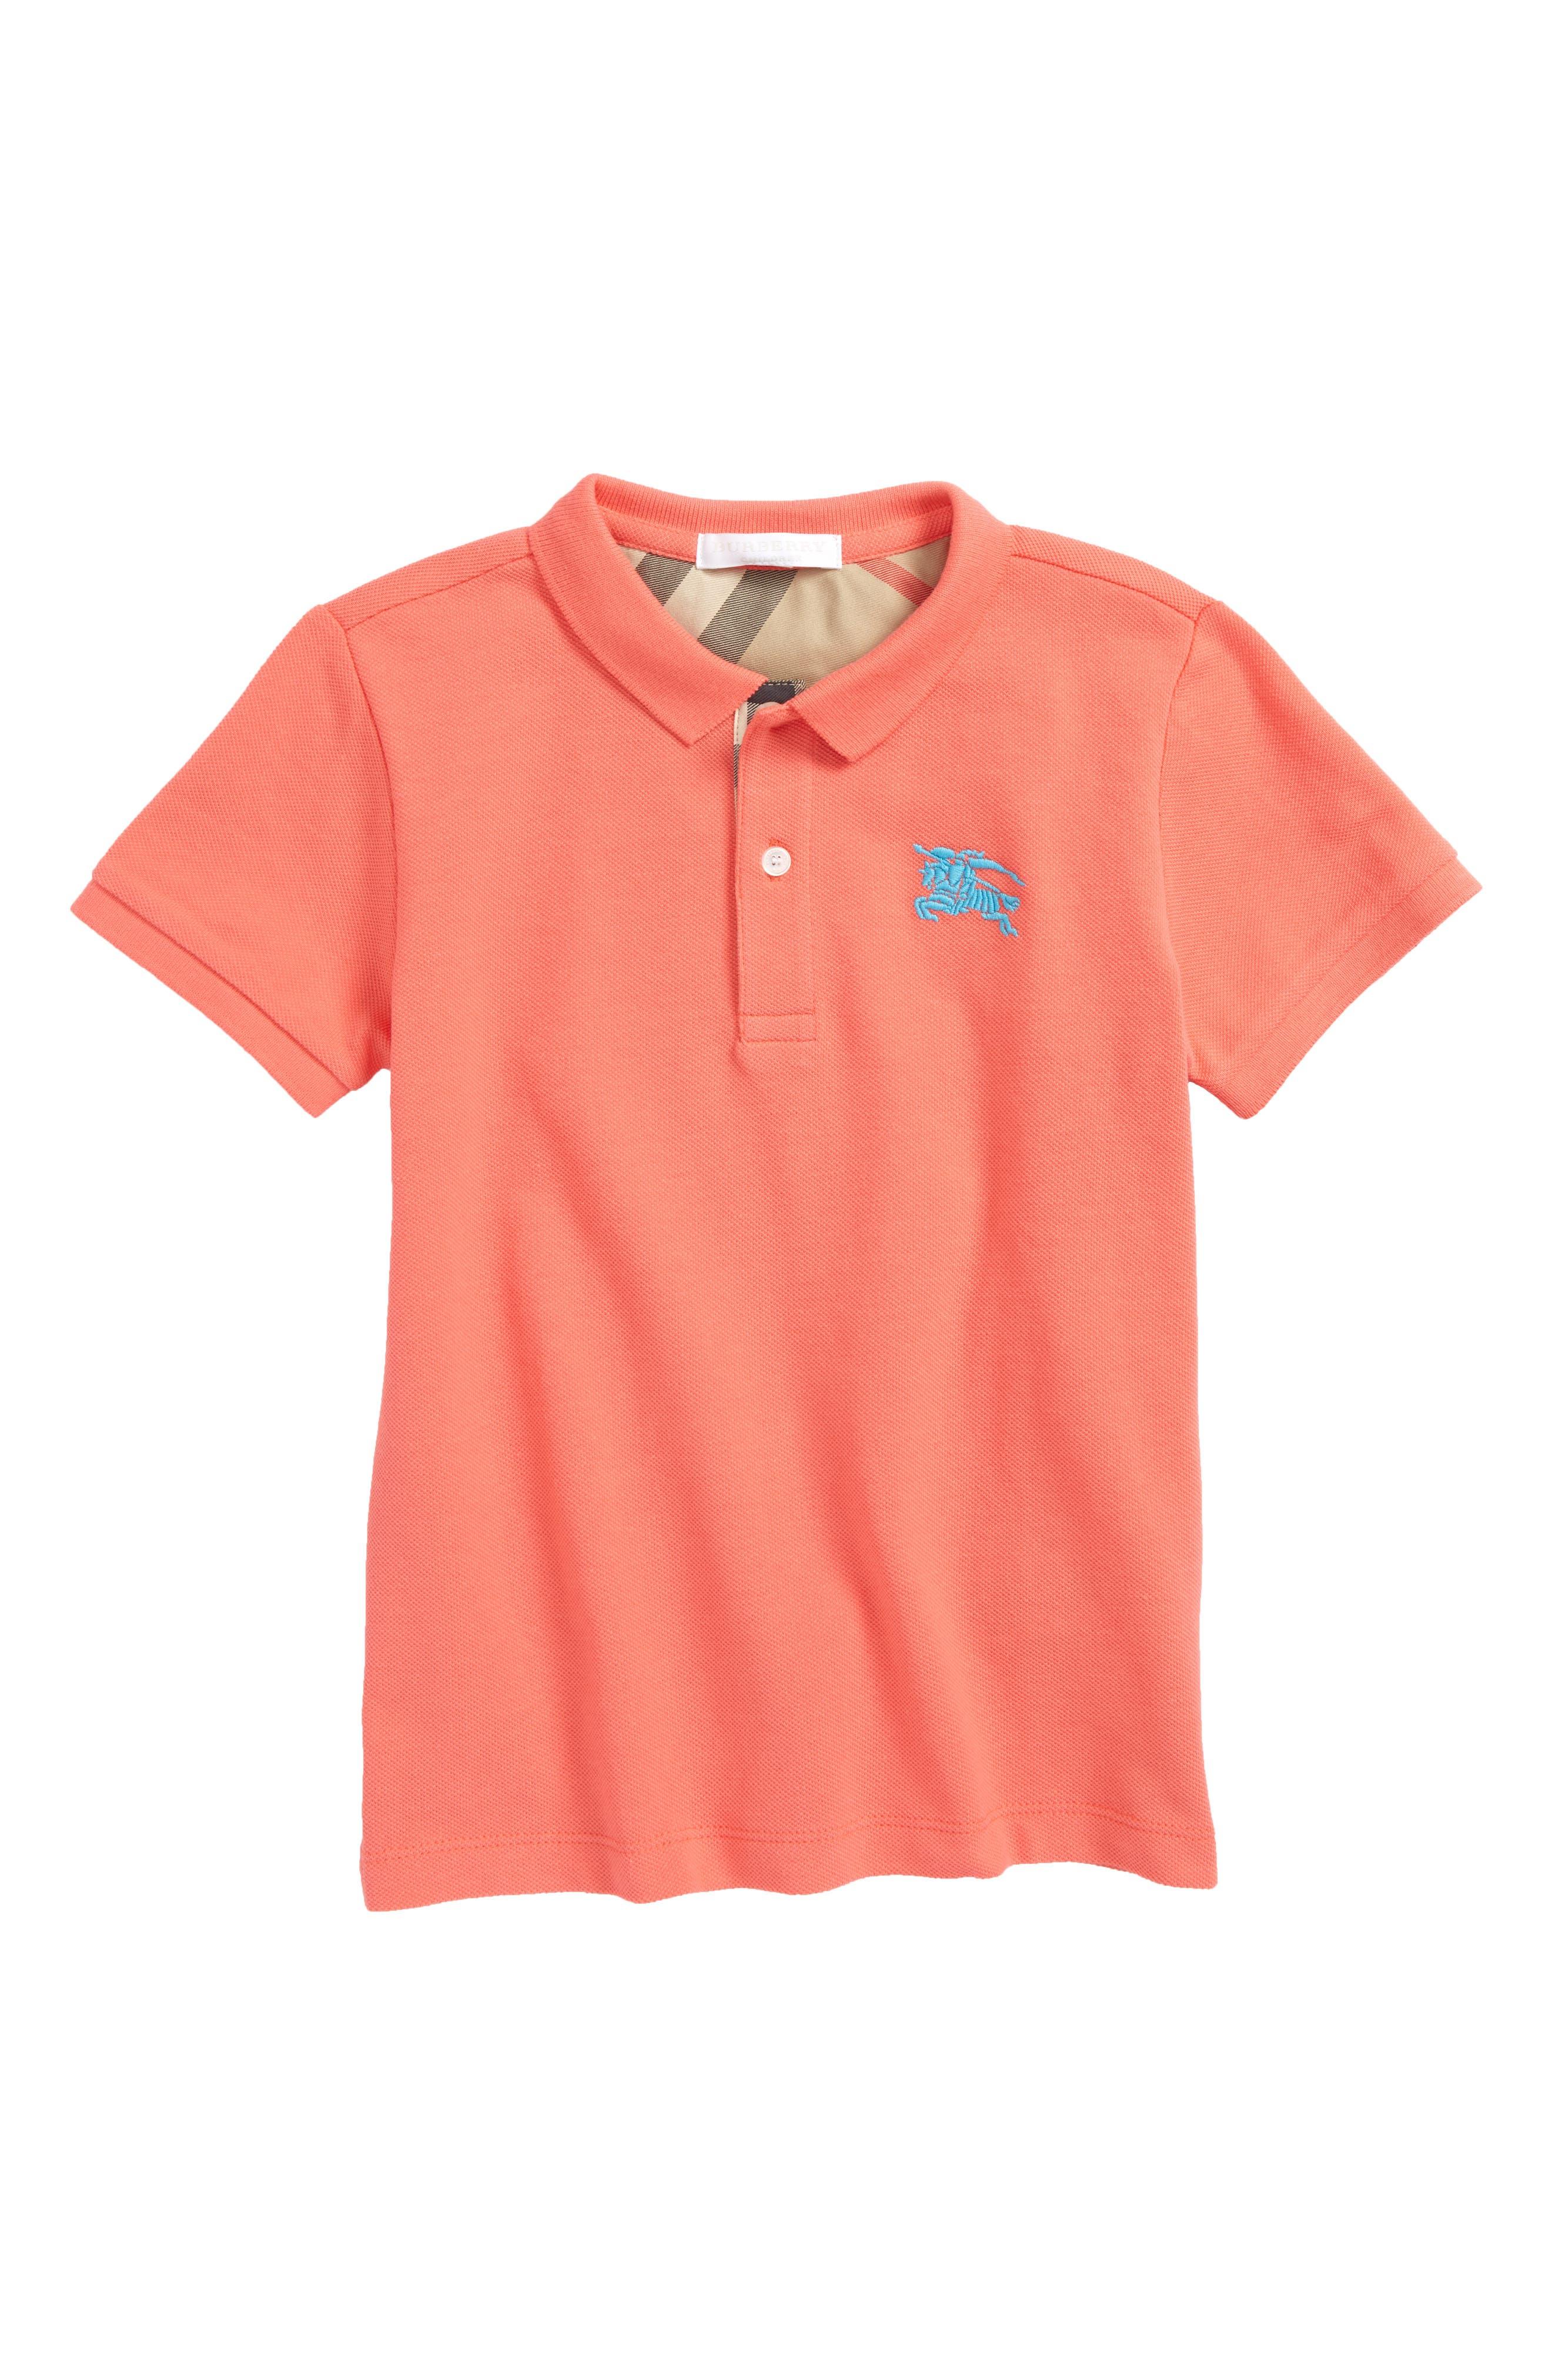 Cotton Piqué Polo,                         Main,                         color, Bright Coral Pink